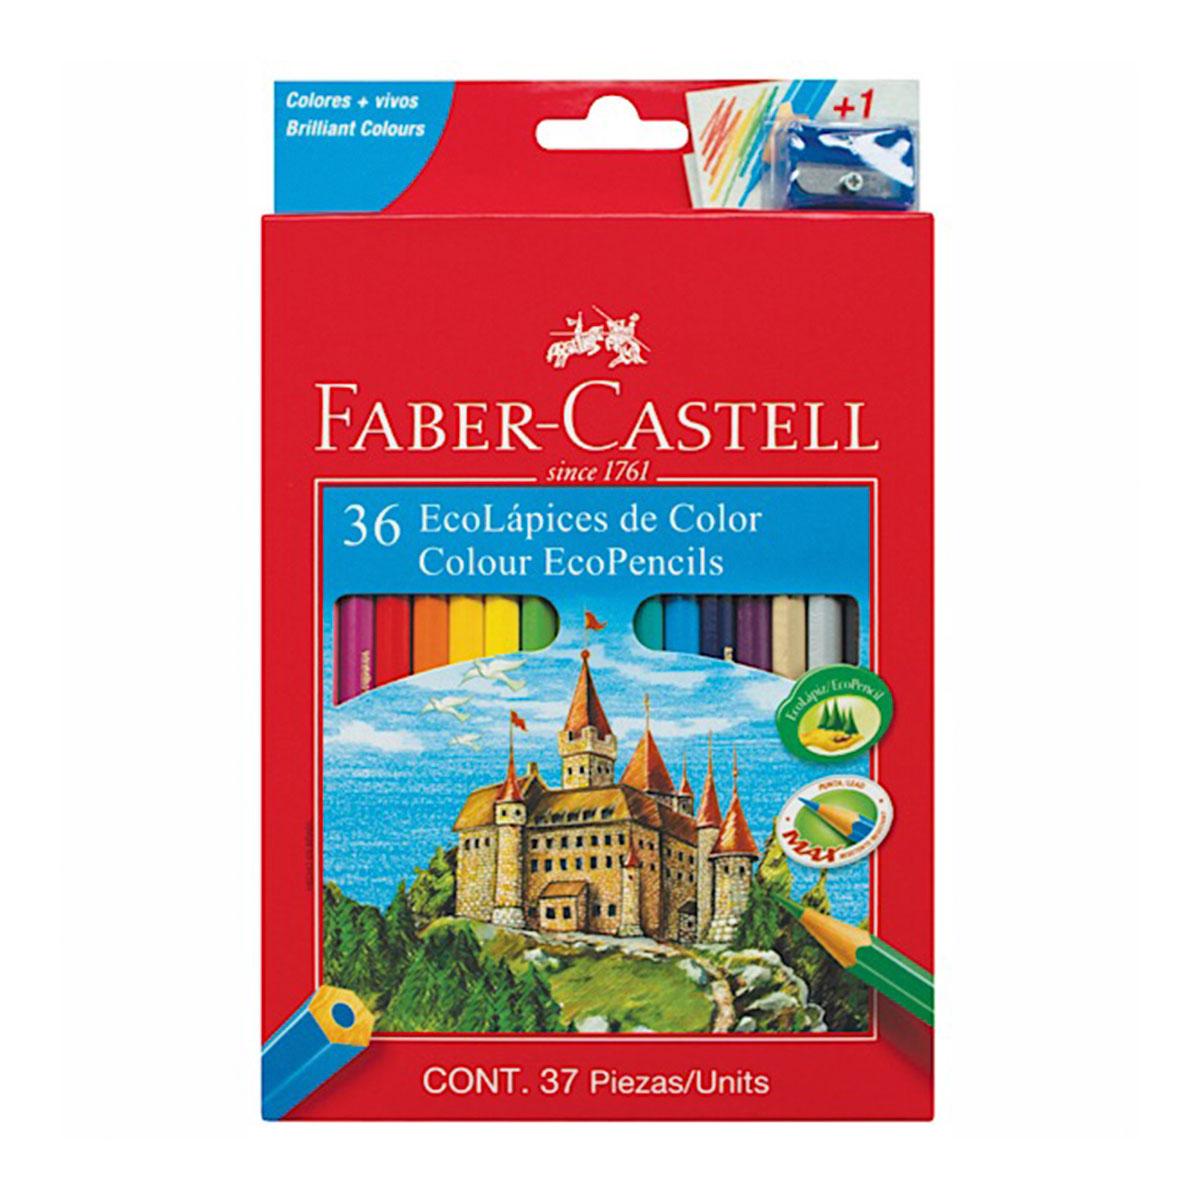 212036 FABER-CASTELL                                                | LAPICES ECOLAPICES POR 36 LARGOS + SACAPUNTAS